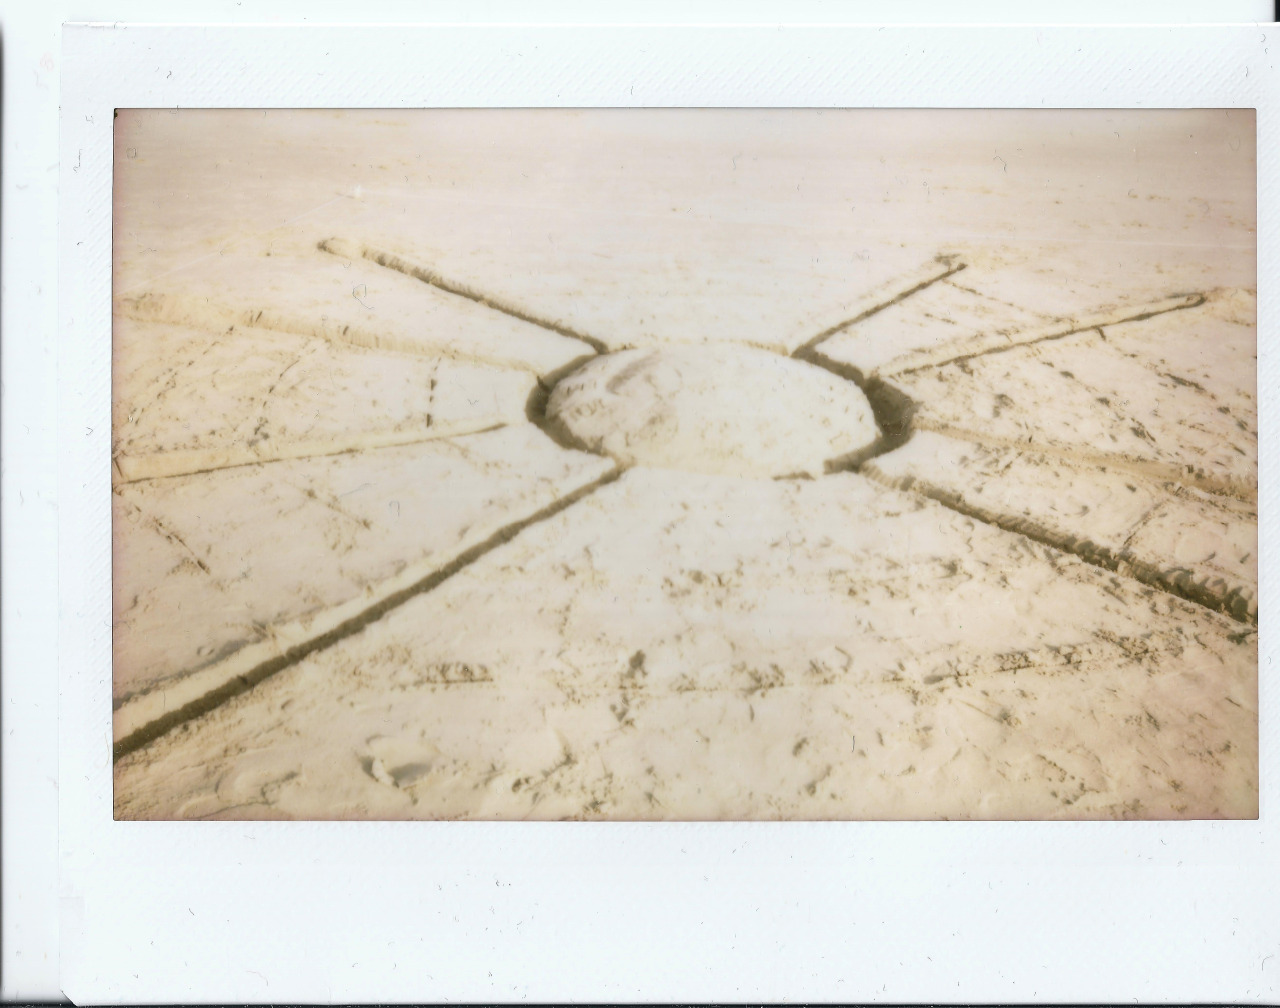 Polaroid 1 - Artefact 1.0